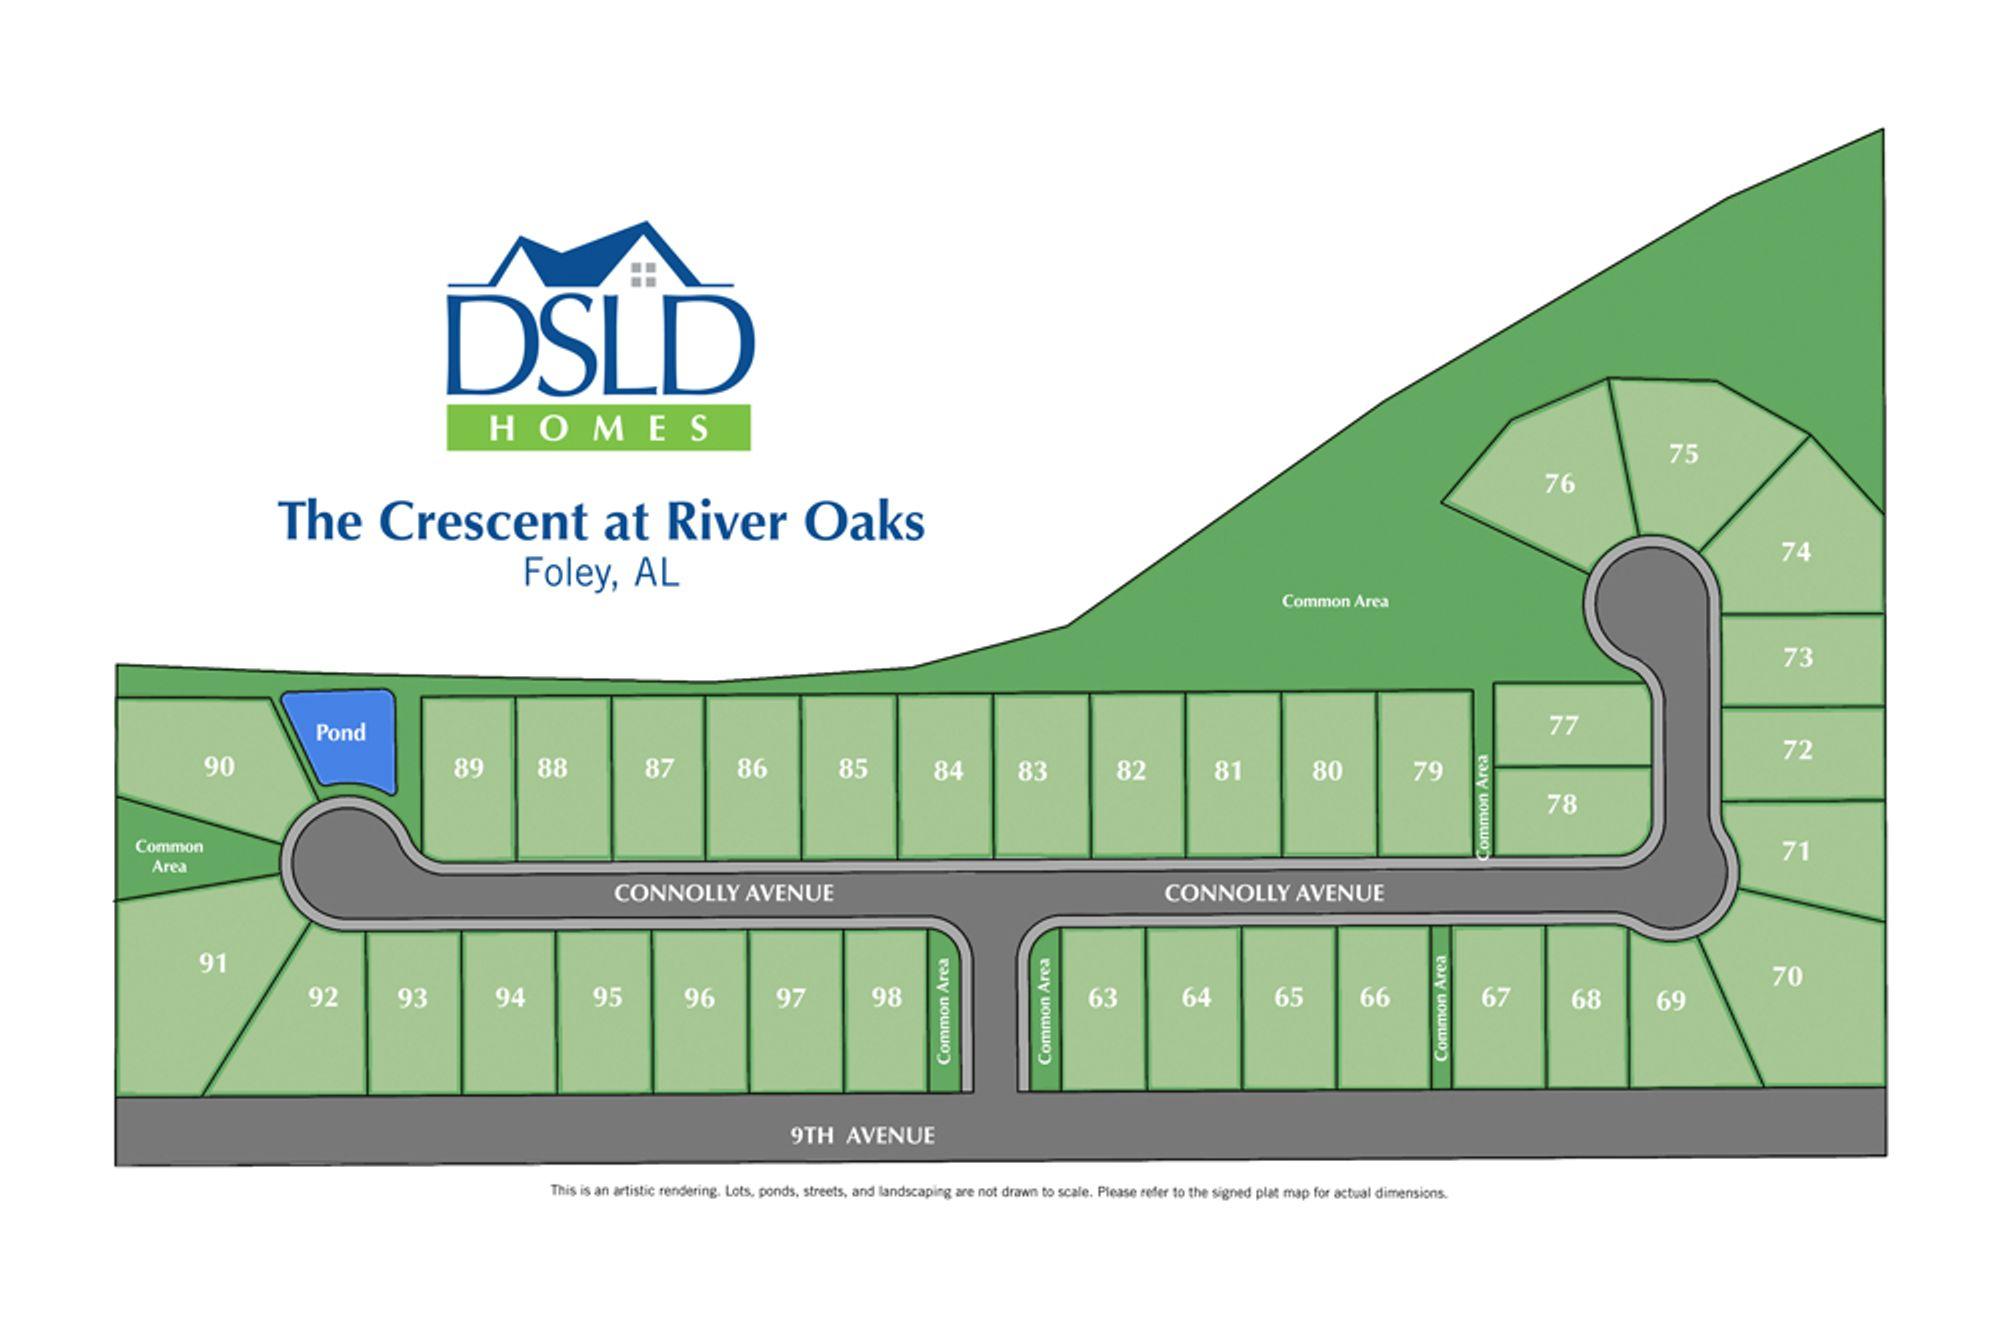 The Crescent at River Oaks